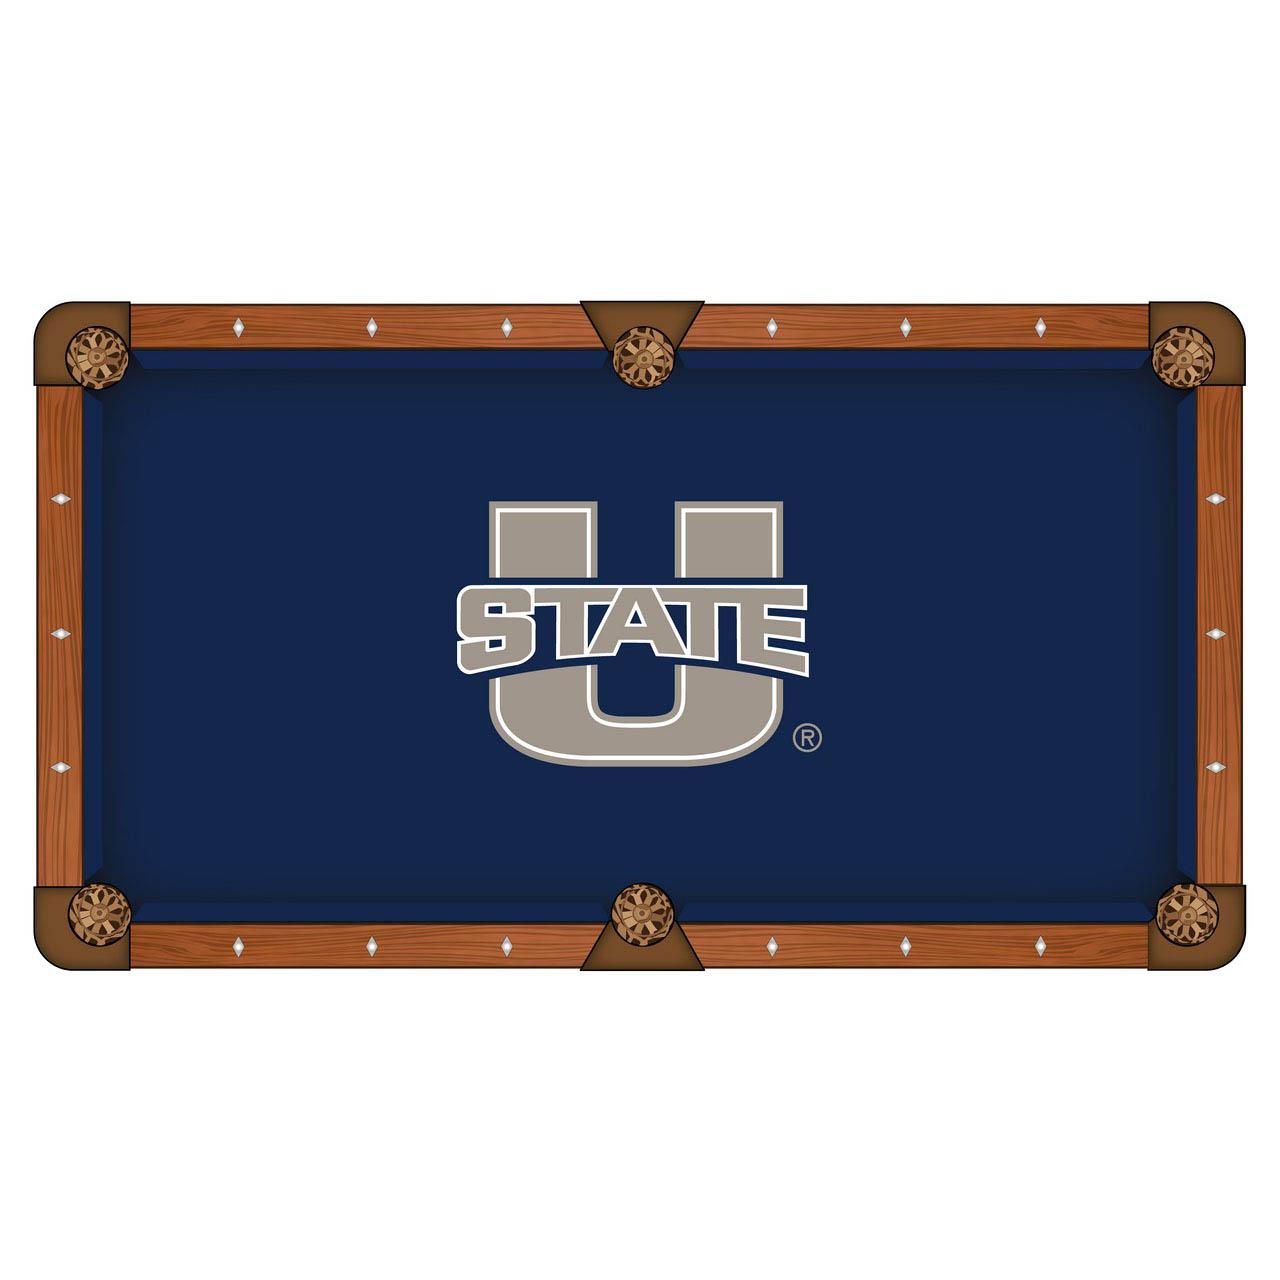 University   Cloth   State   Table   Pool   Utah